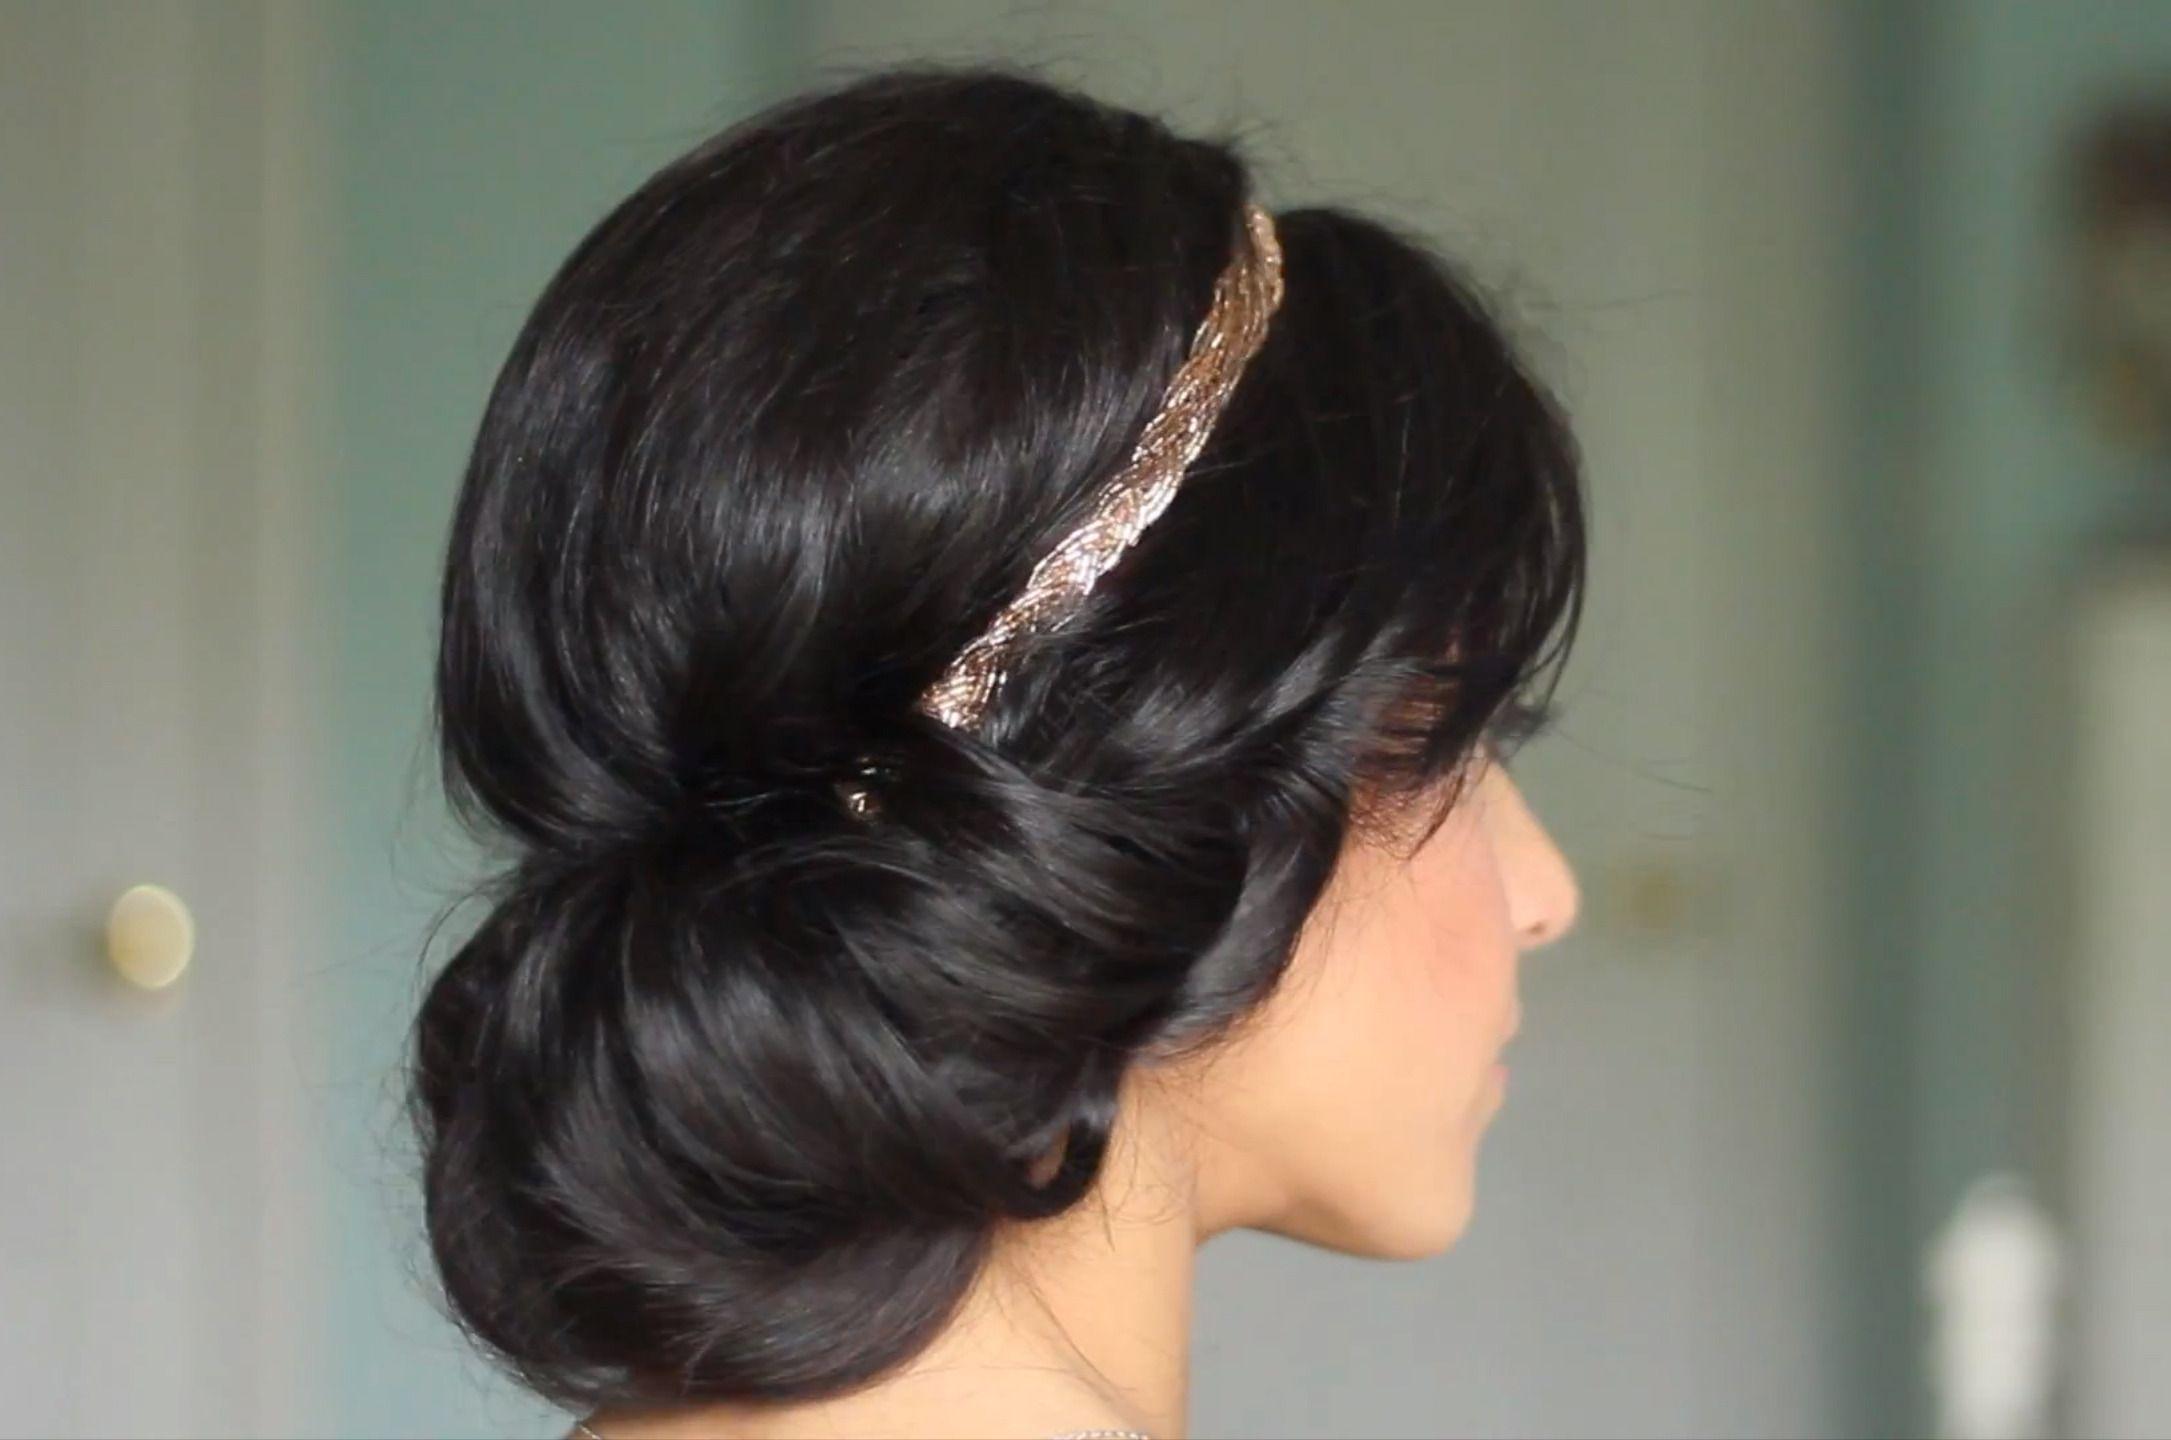 Perfect prom hairstyles prom hairstyles prom and prom hair tutorial